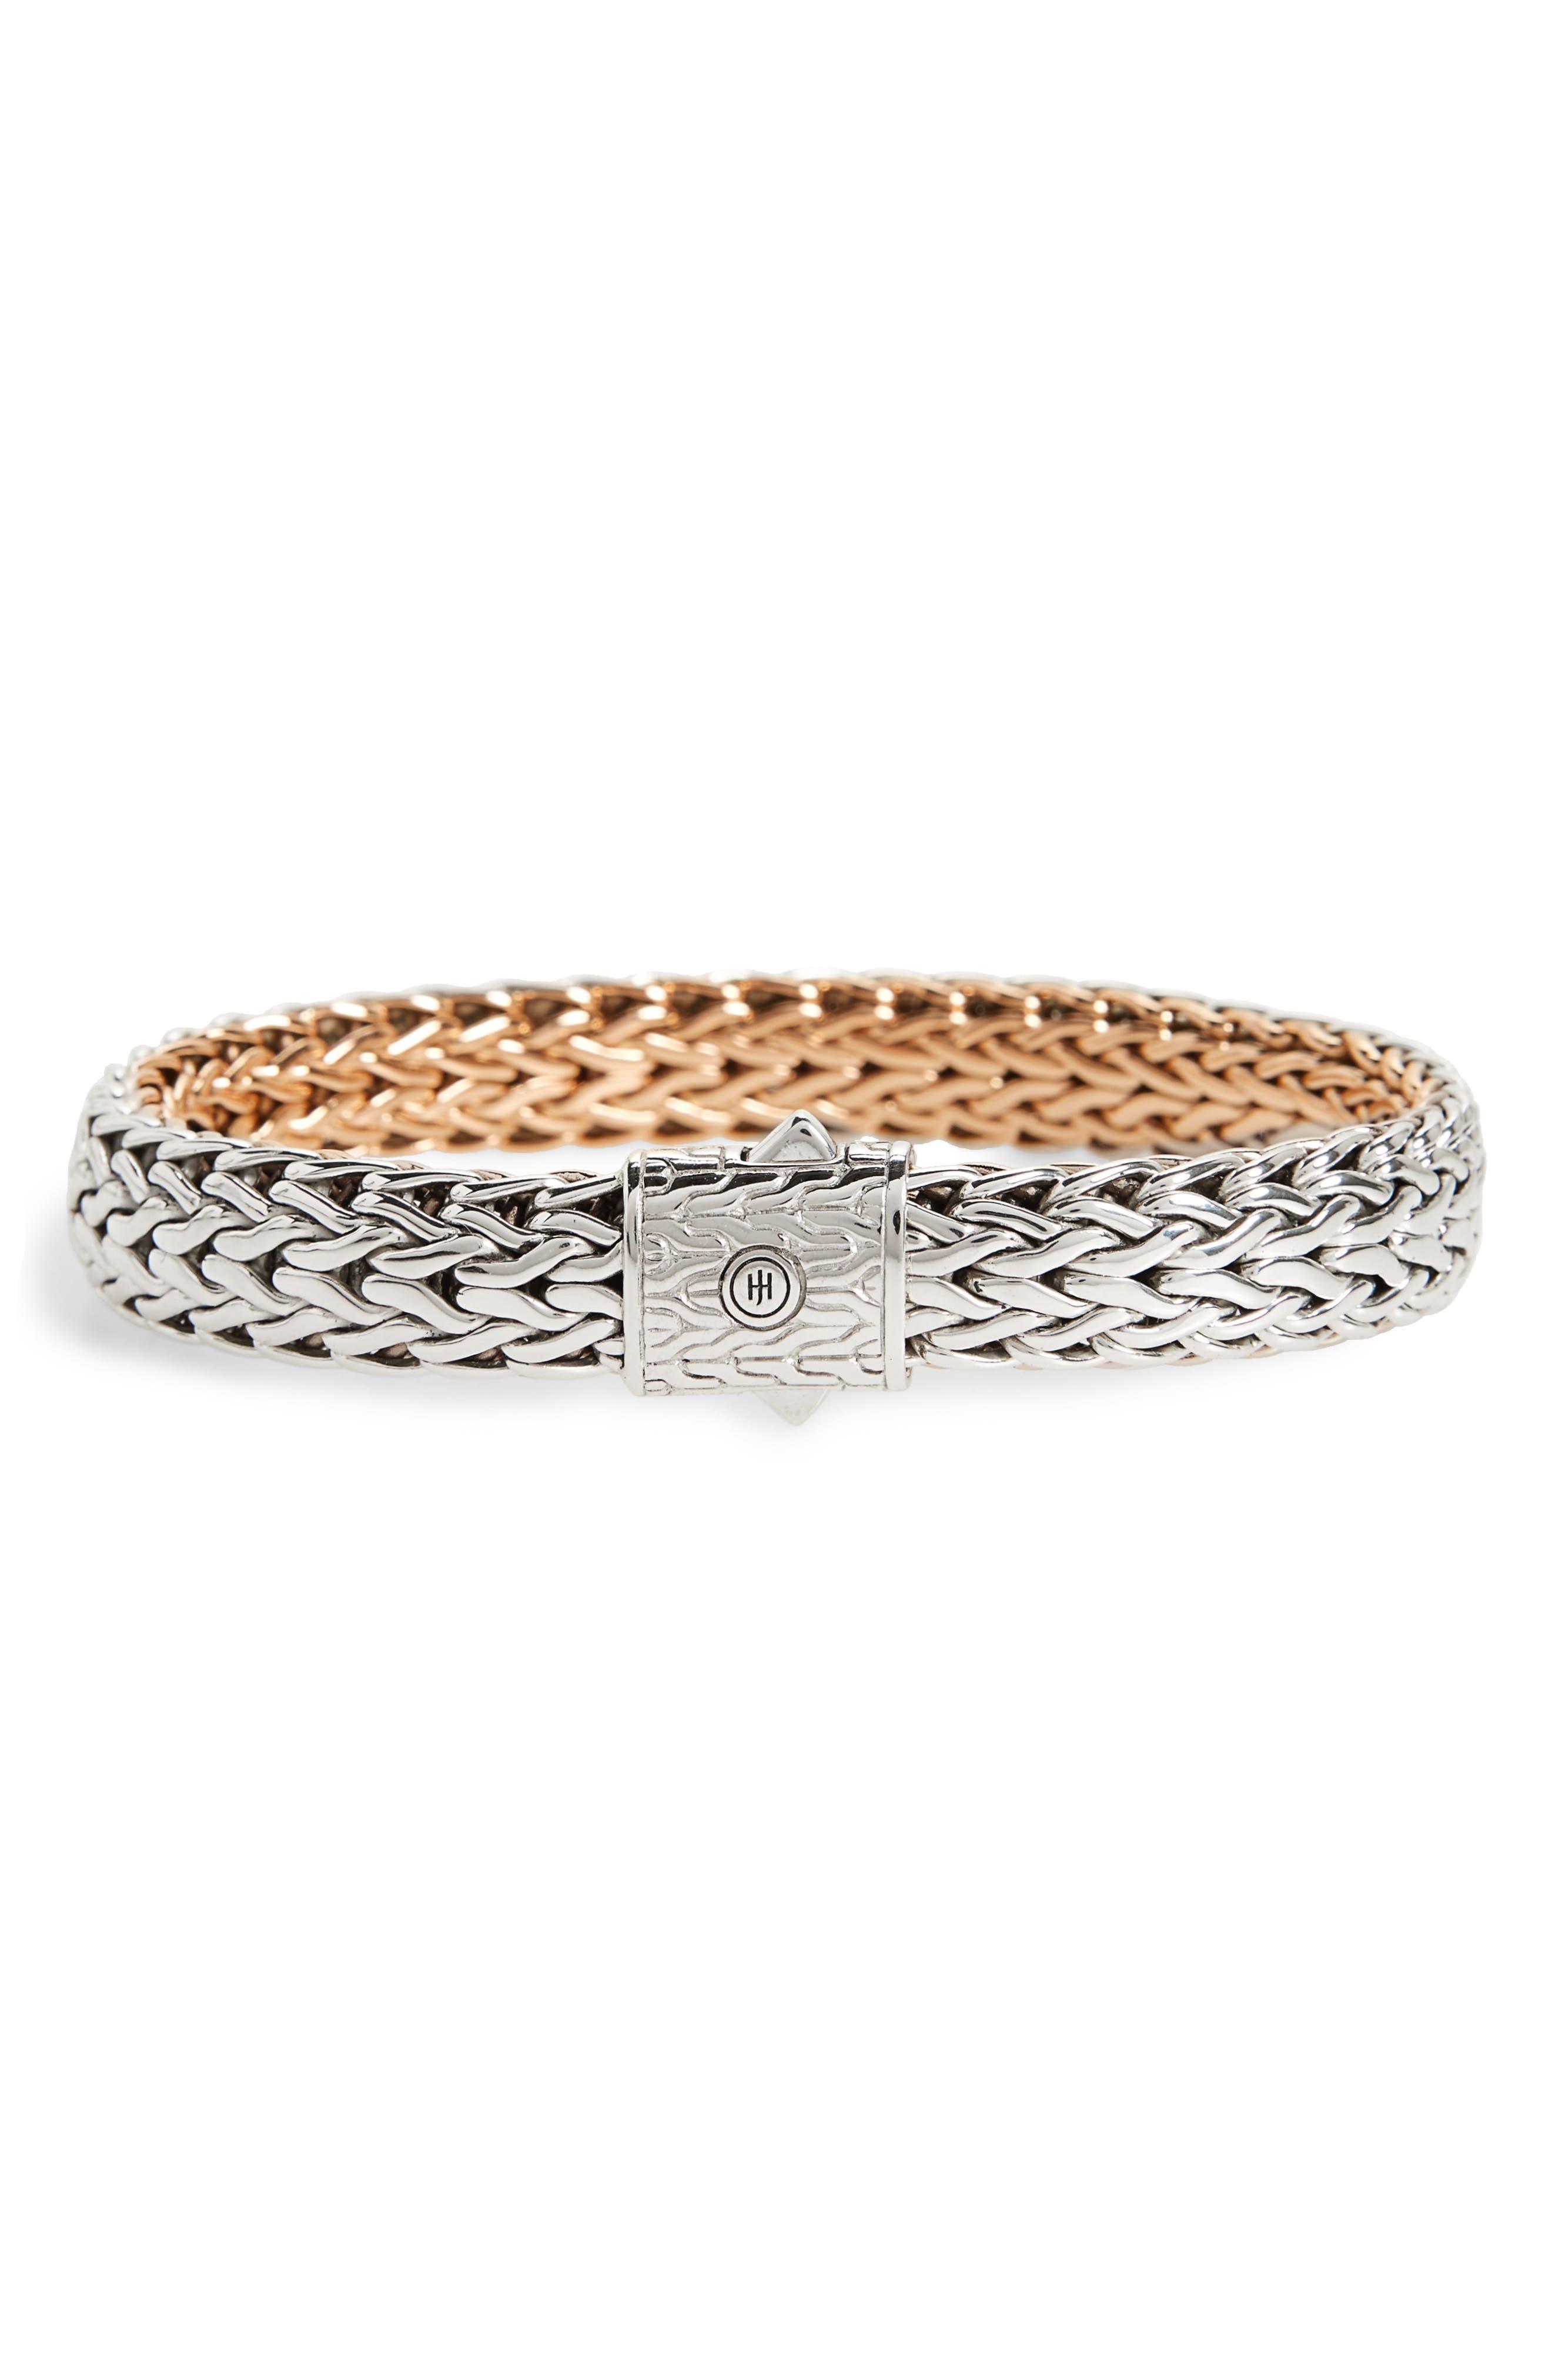 Main Image - John Hardy Classic Chain Flat Chain Reversible Bracelet